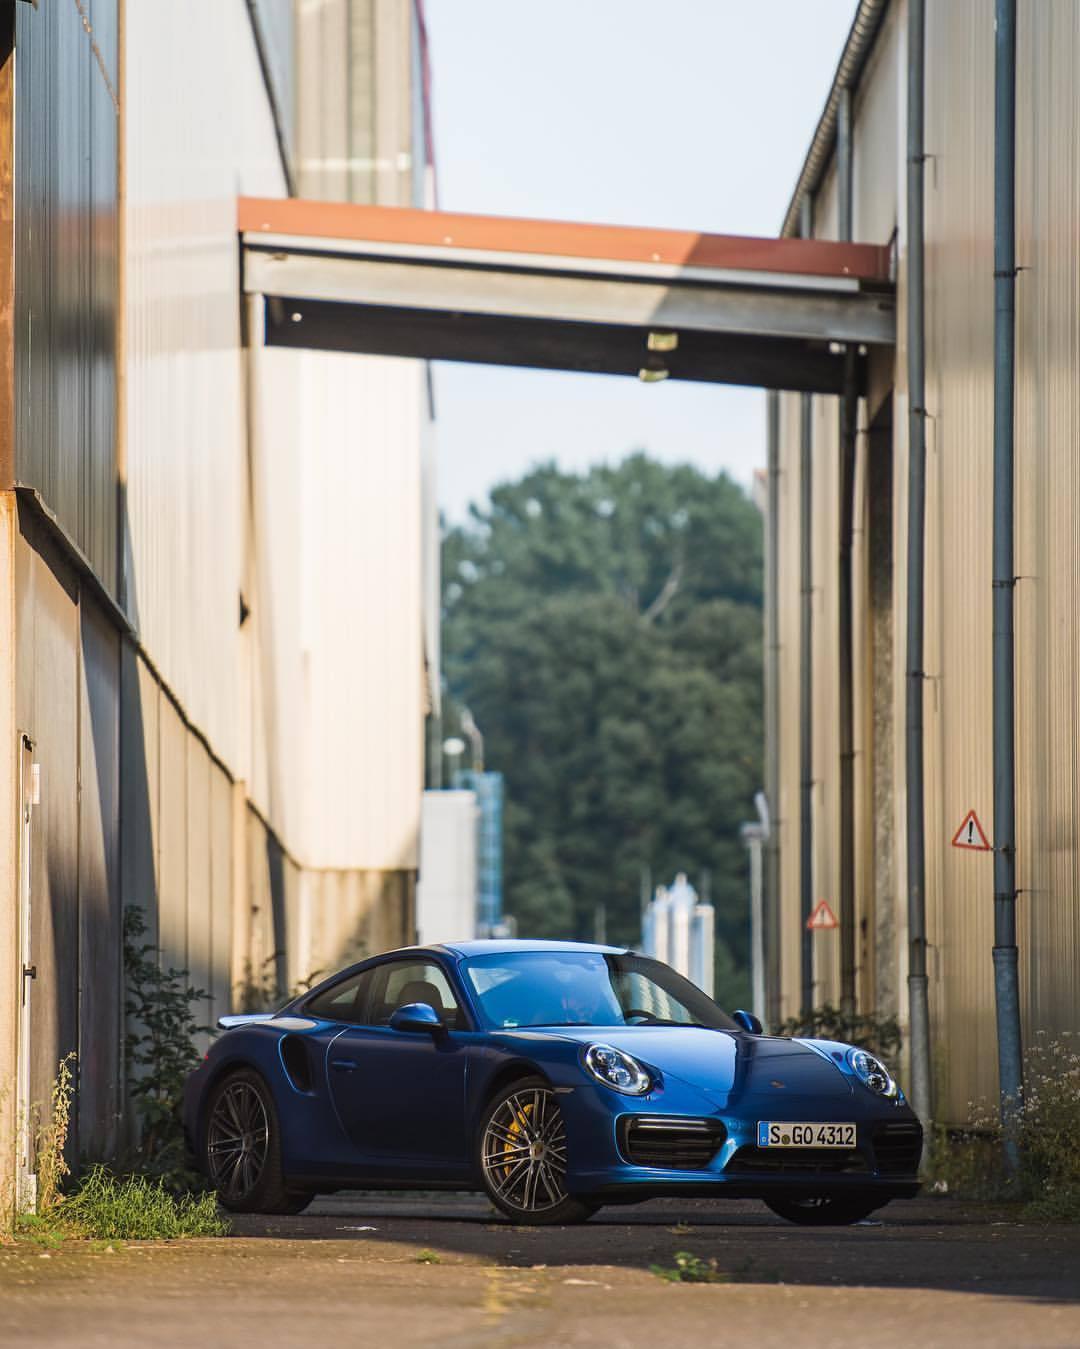 Turbo.   with @heldth   #porsche #911turbo #porsche911 #911 #blue #🚙💨 #legendsneverdie #carsofinstagram #instacar #🔥 #💪🏽 (at Cologne, Germany)